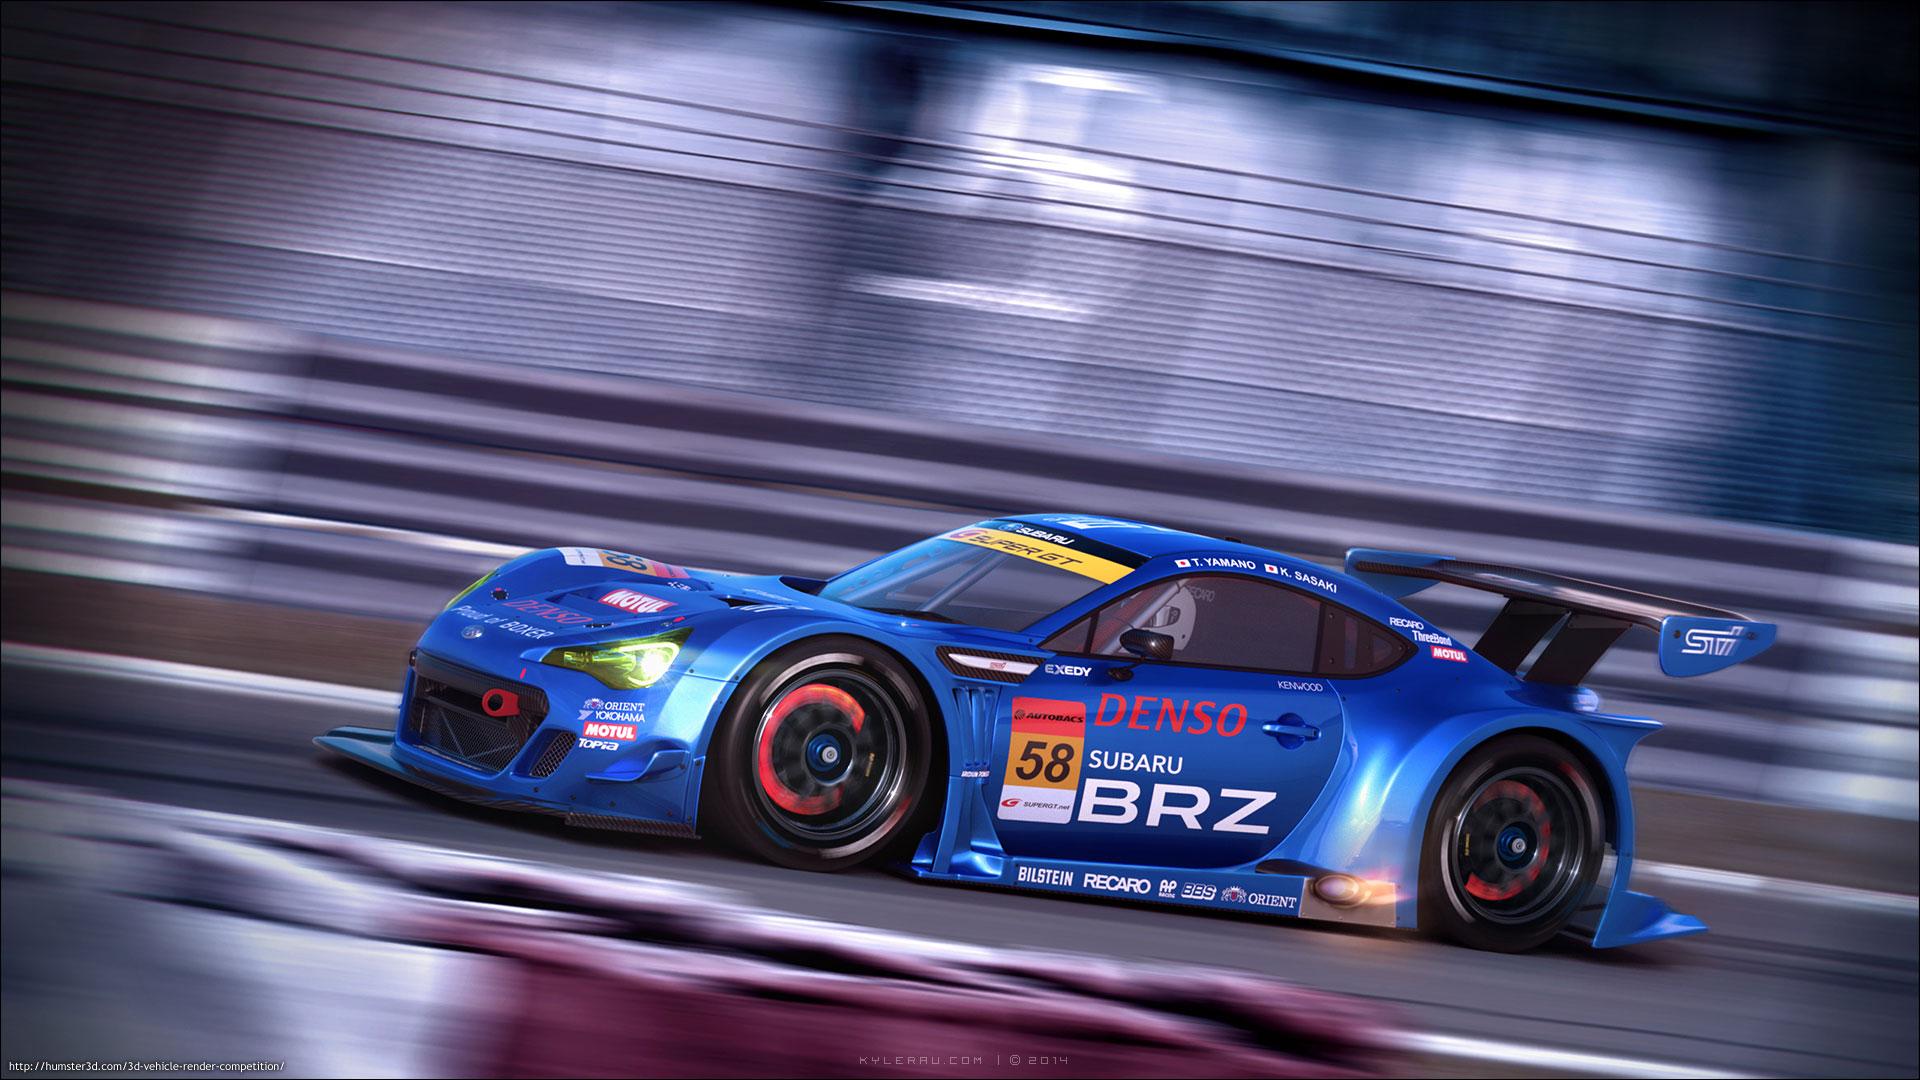 Subaru BRZ 3d art